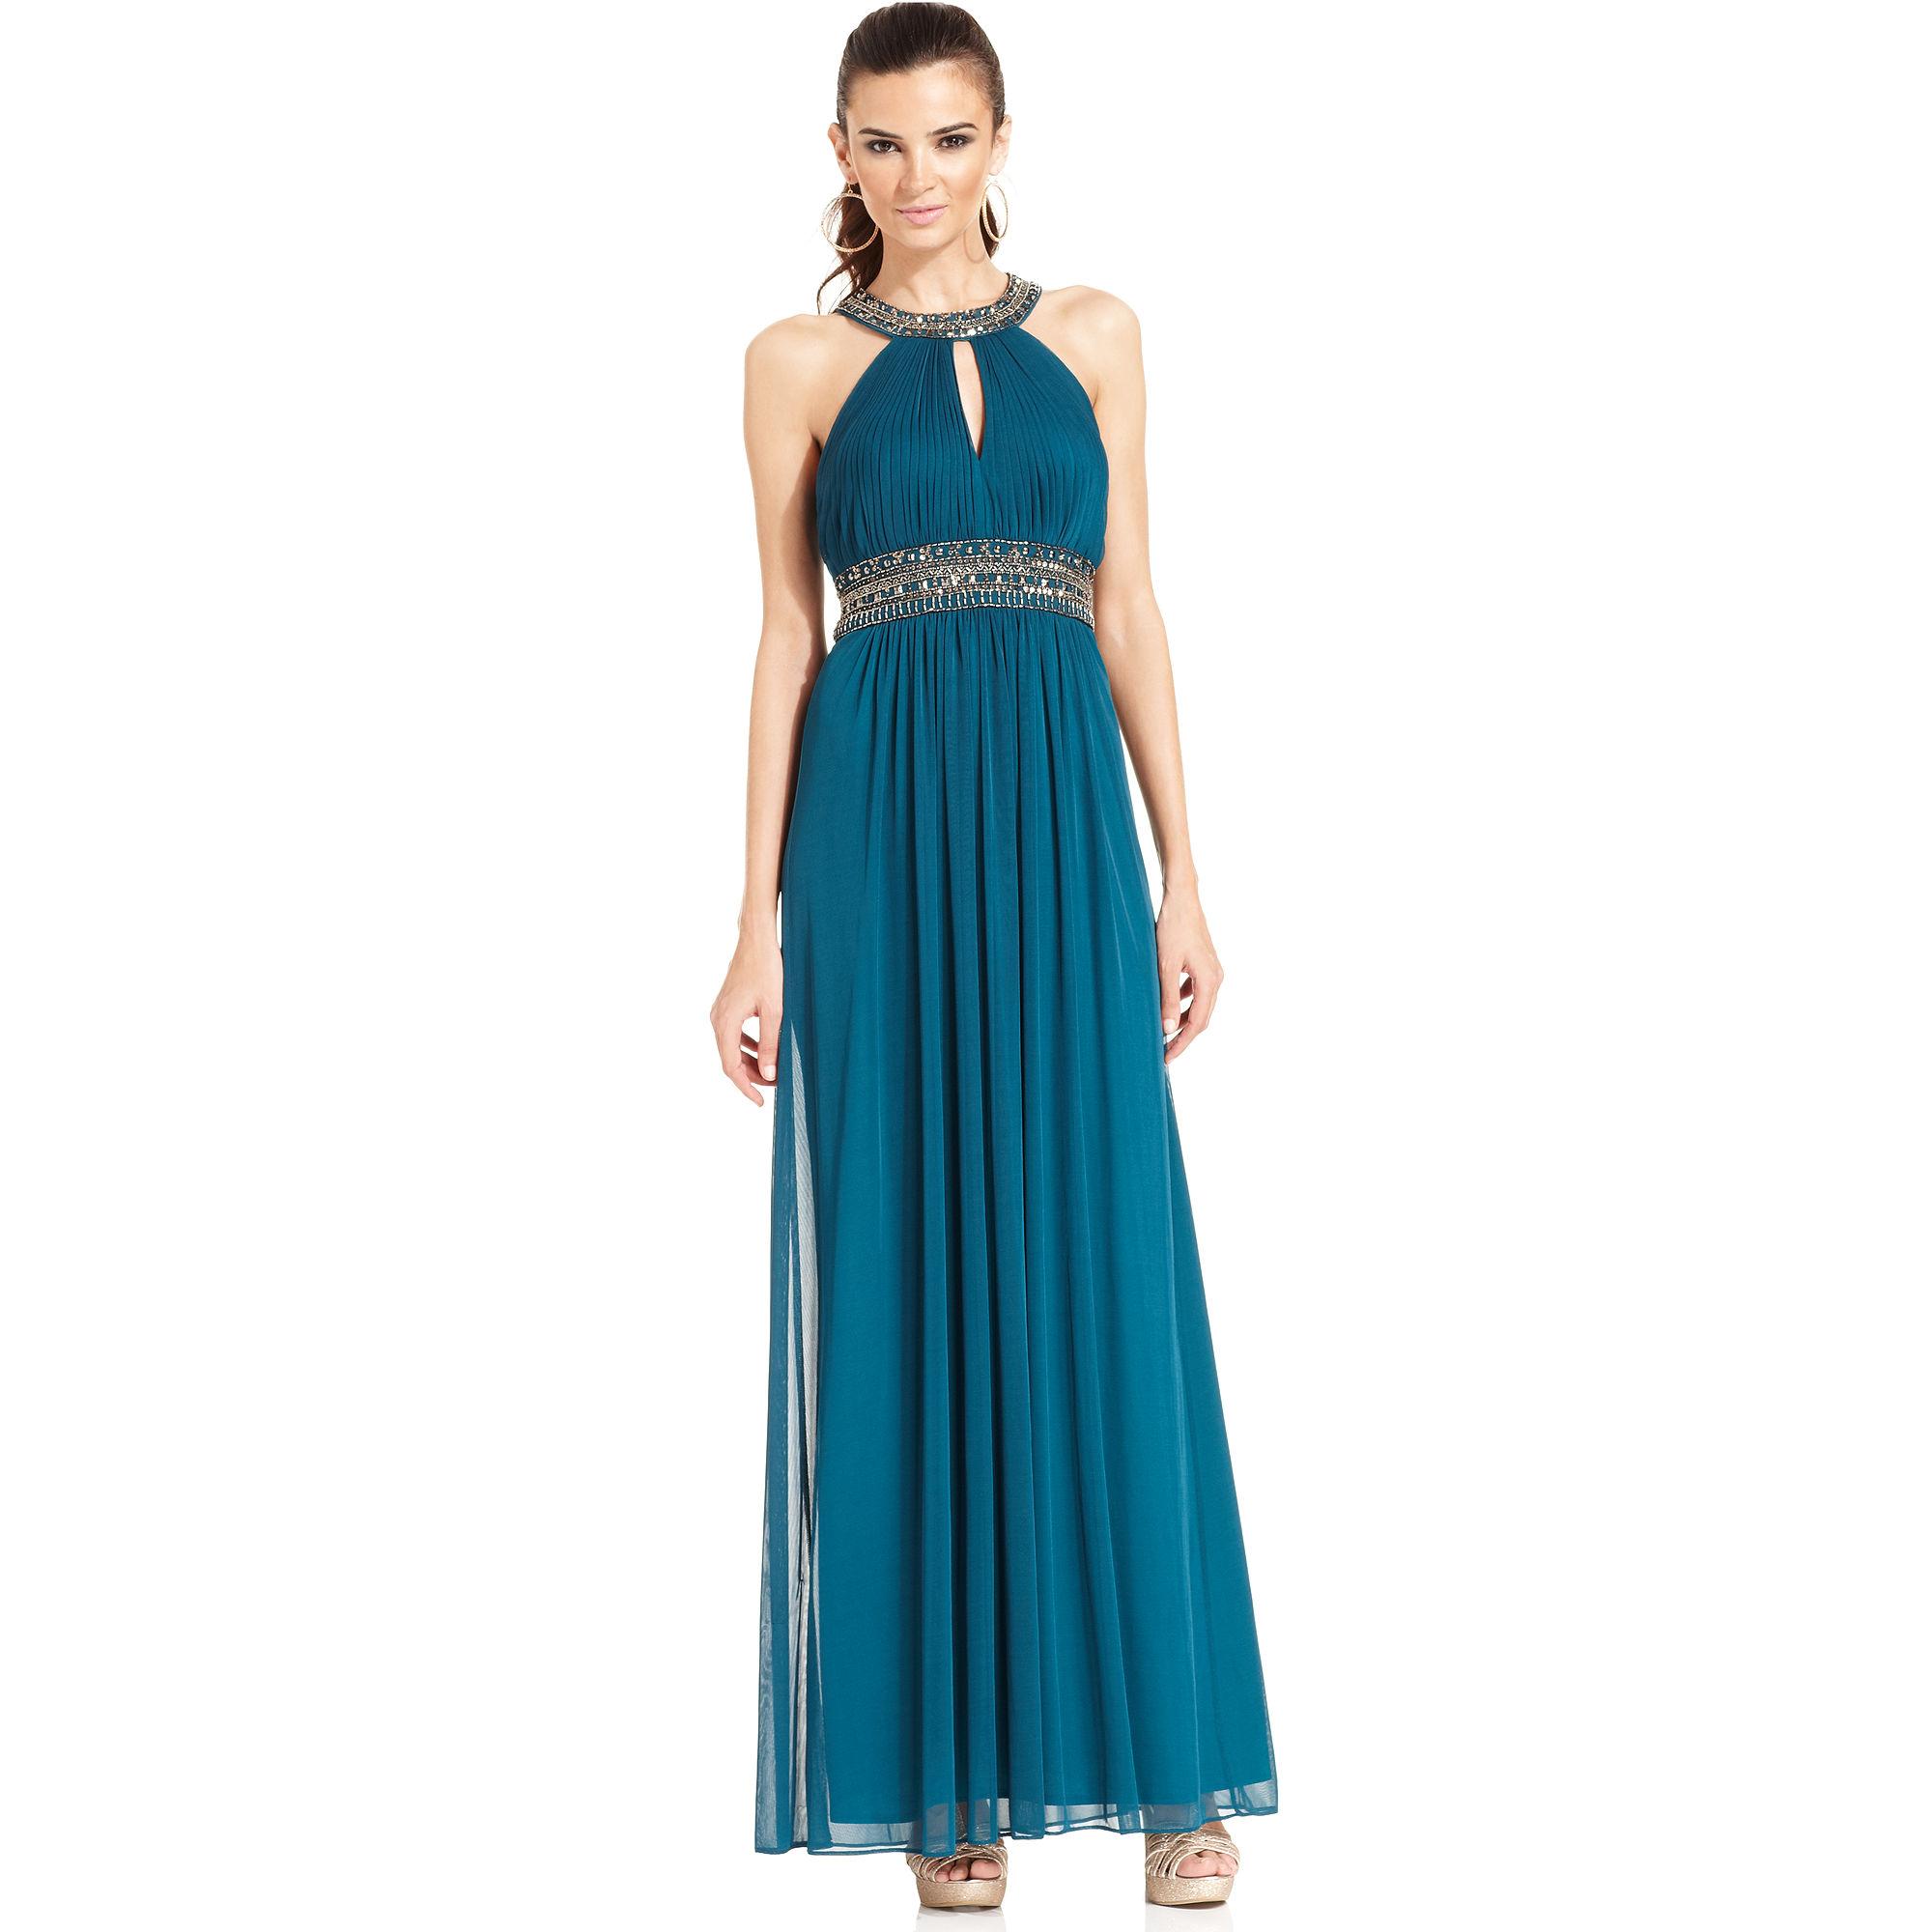 Lyst - Xscape Xscape Dress Sleeveless Jeweltrim Pleated Halter Gown ...